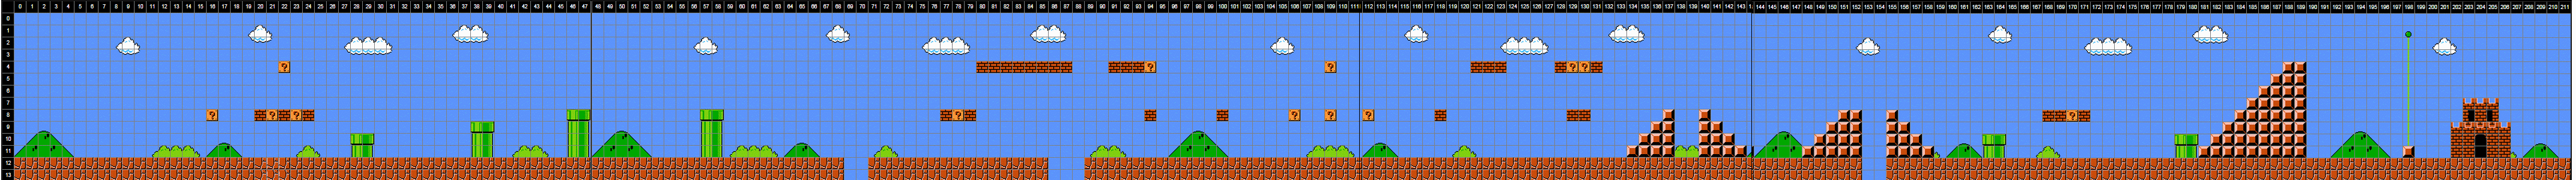 Drawn pixel art mario level Display golf with Pixel 2: